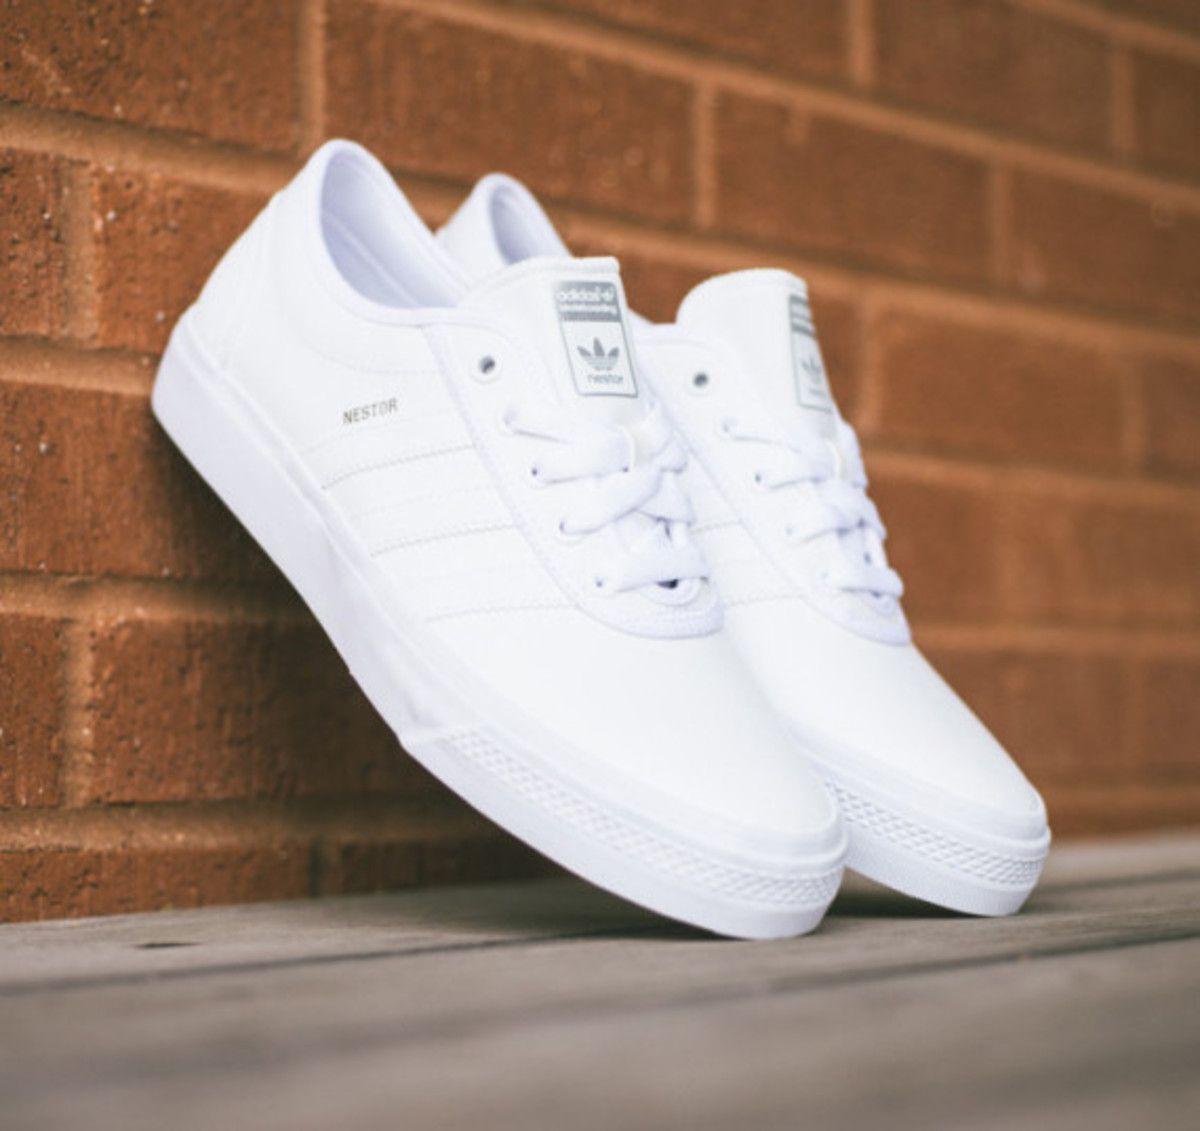 calzature adidas online